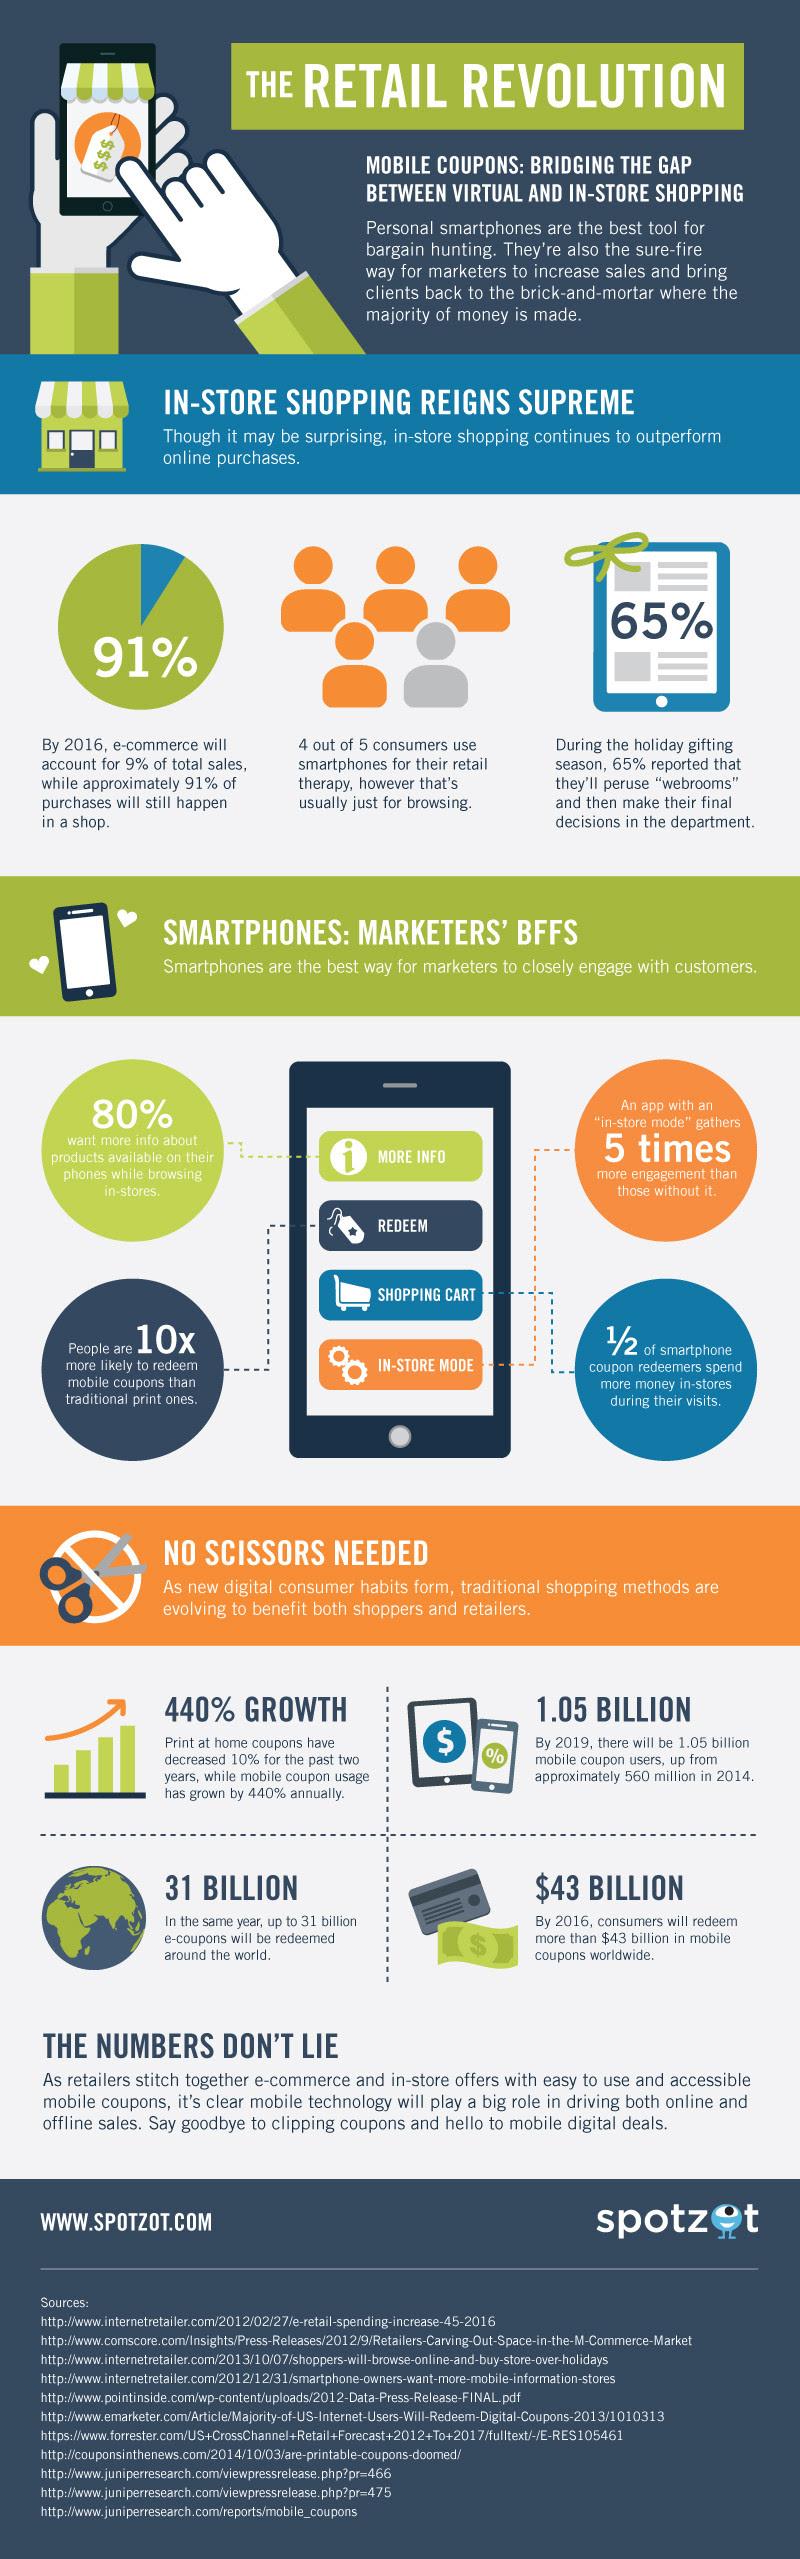 Infographic: The Retail Revolution